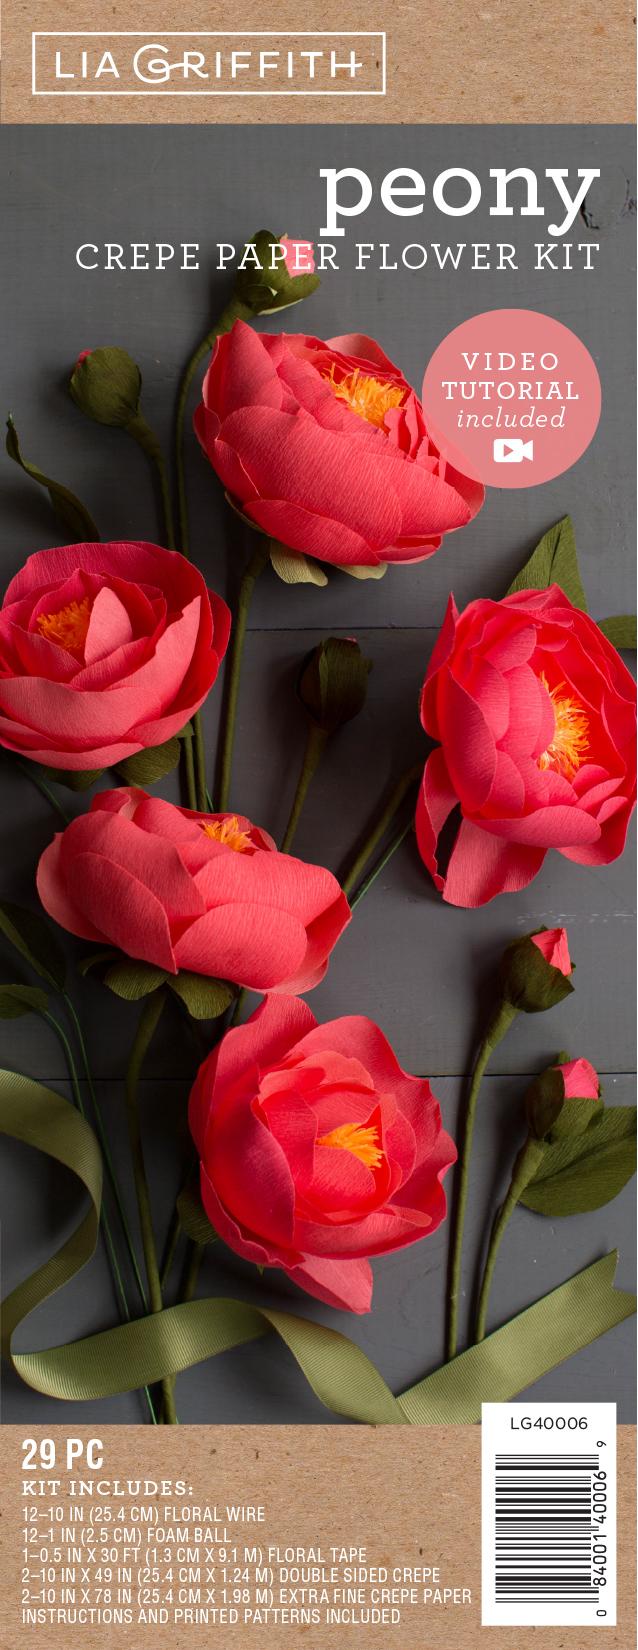 Crepe Paper Flower Kit Yeder Berglauf Verband Com